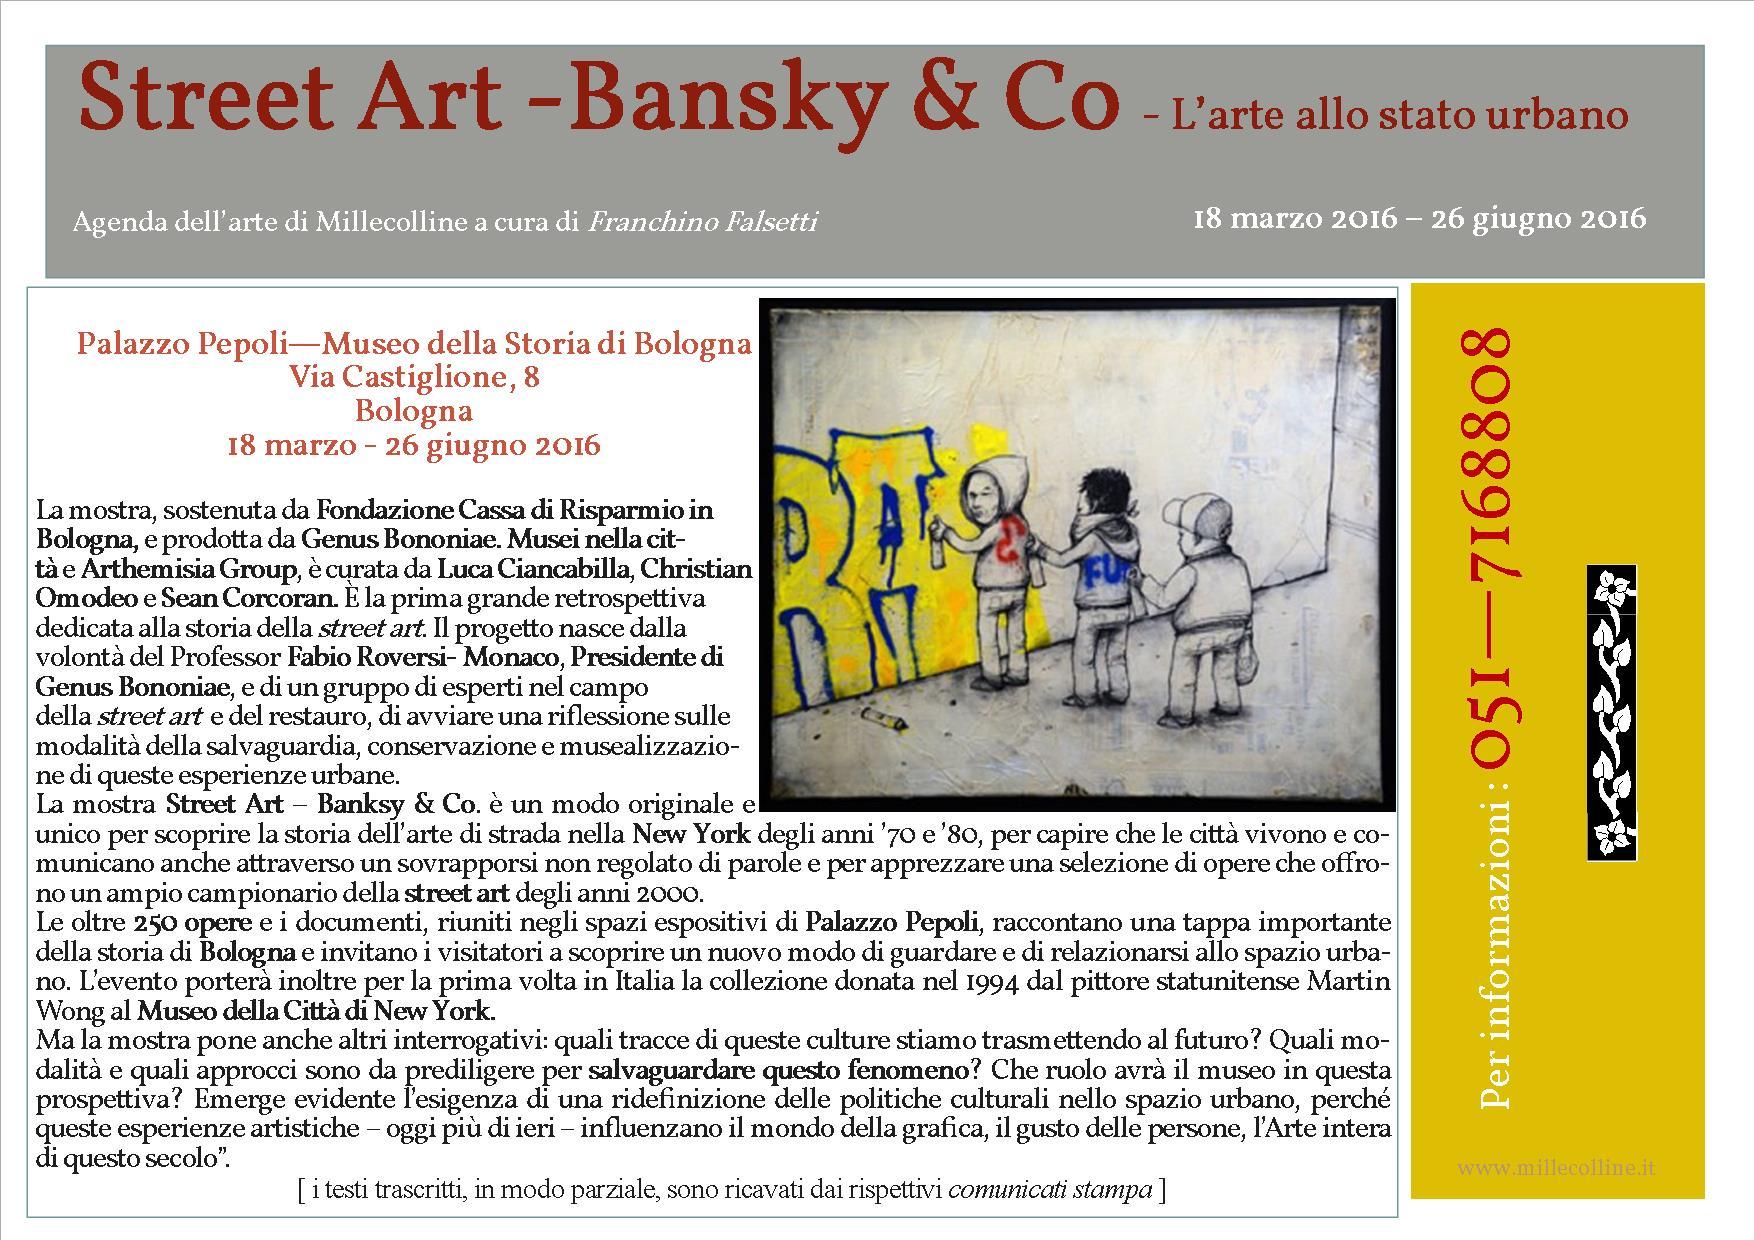 Agenda - Bansky